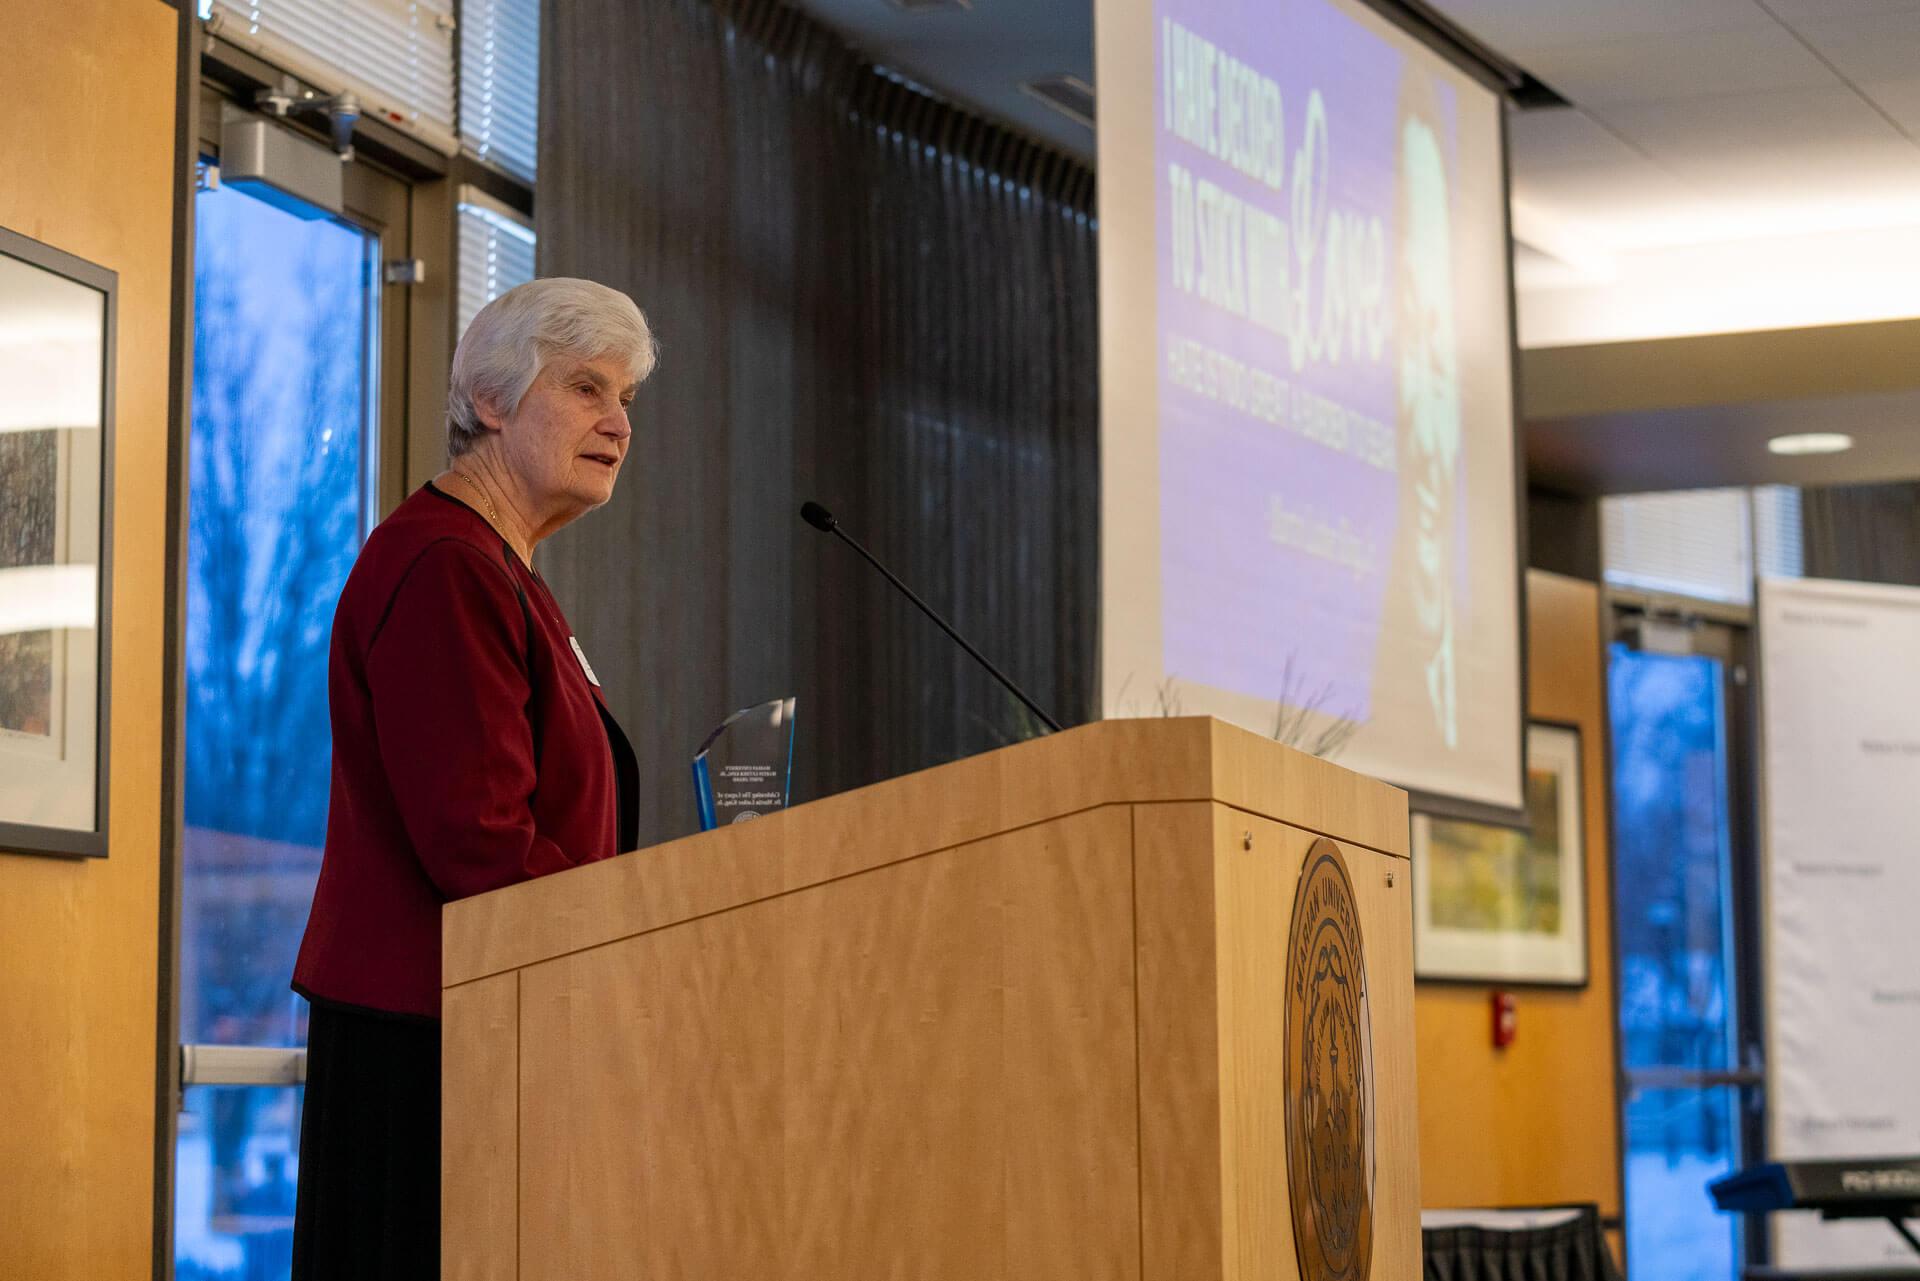 Sister Jean at podium